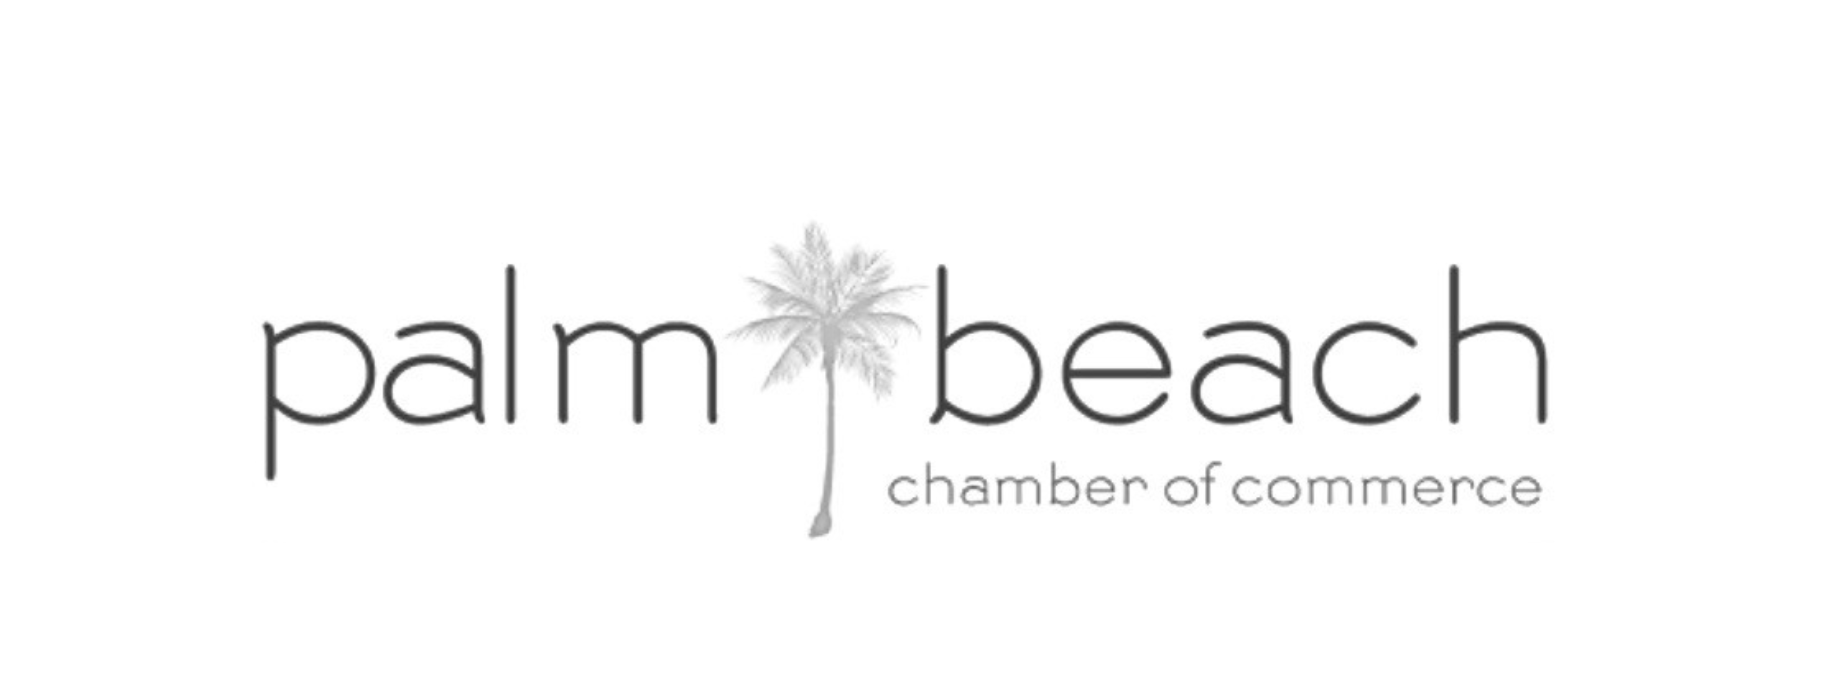 Palm Beach Chamber Commerce logo 2 bw-1